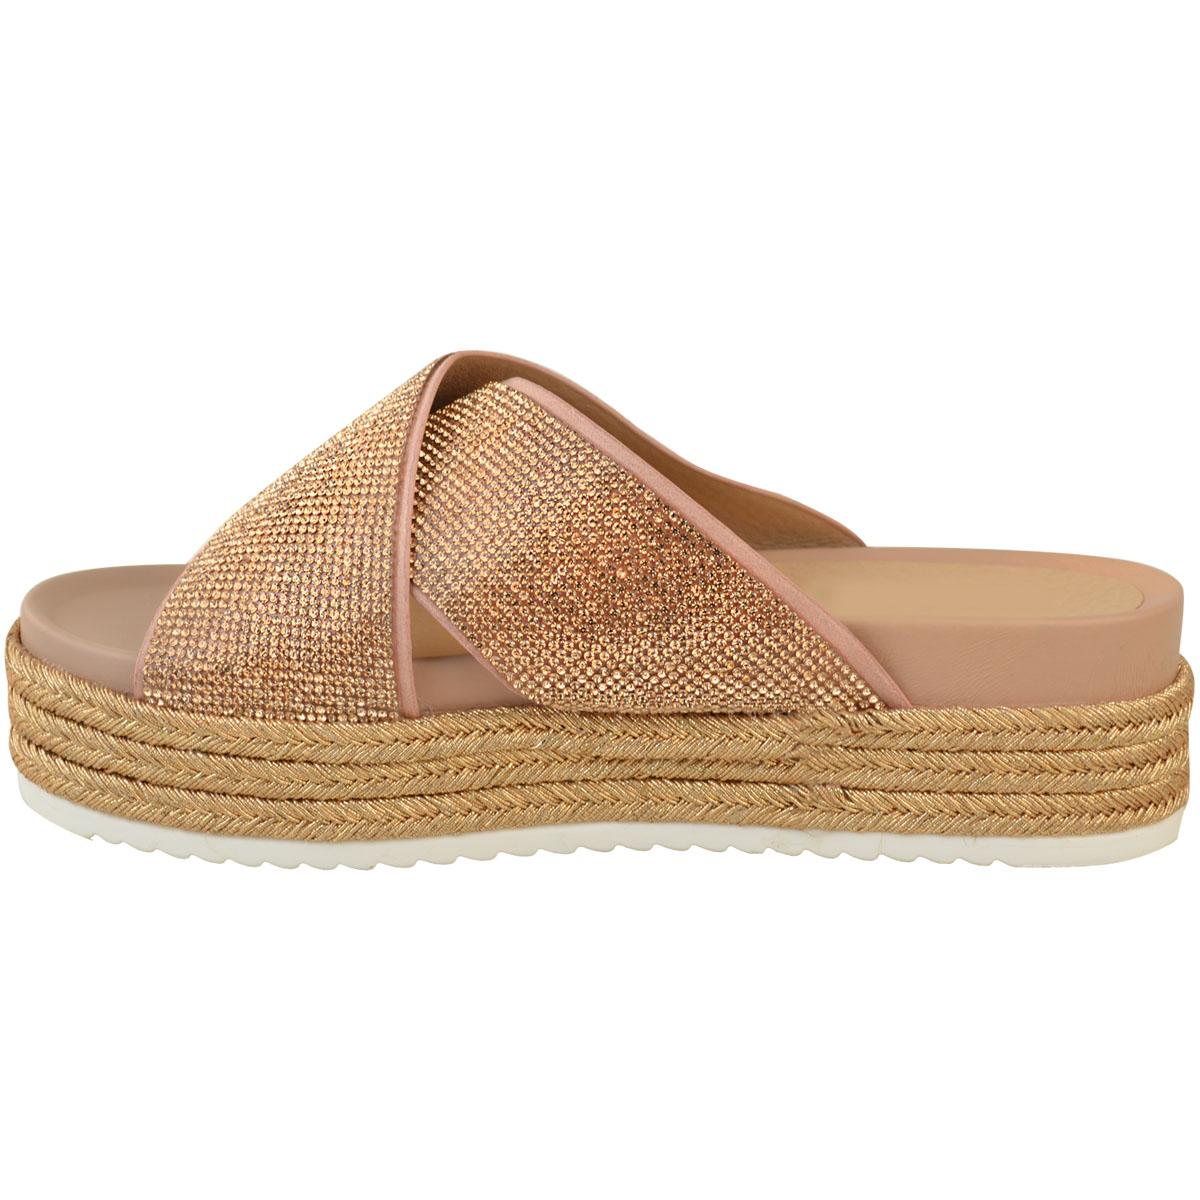 Womens-Ladies-Diamante-Slip-On-Sandals-Flatforms-Sparkly-Platform-Summer-Size-UK thumbnail 10